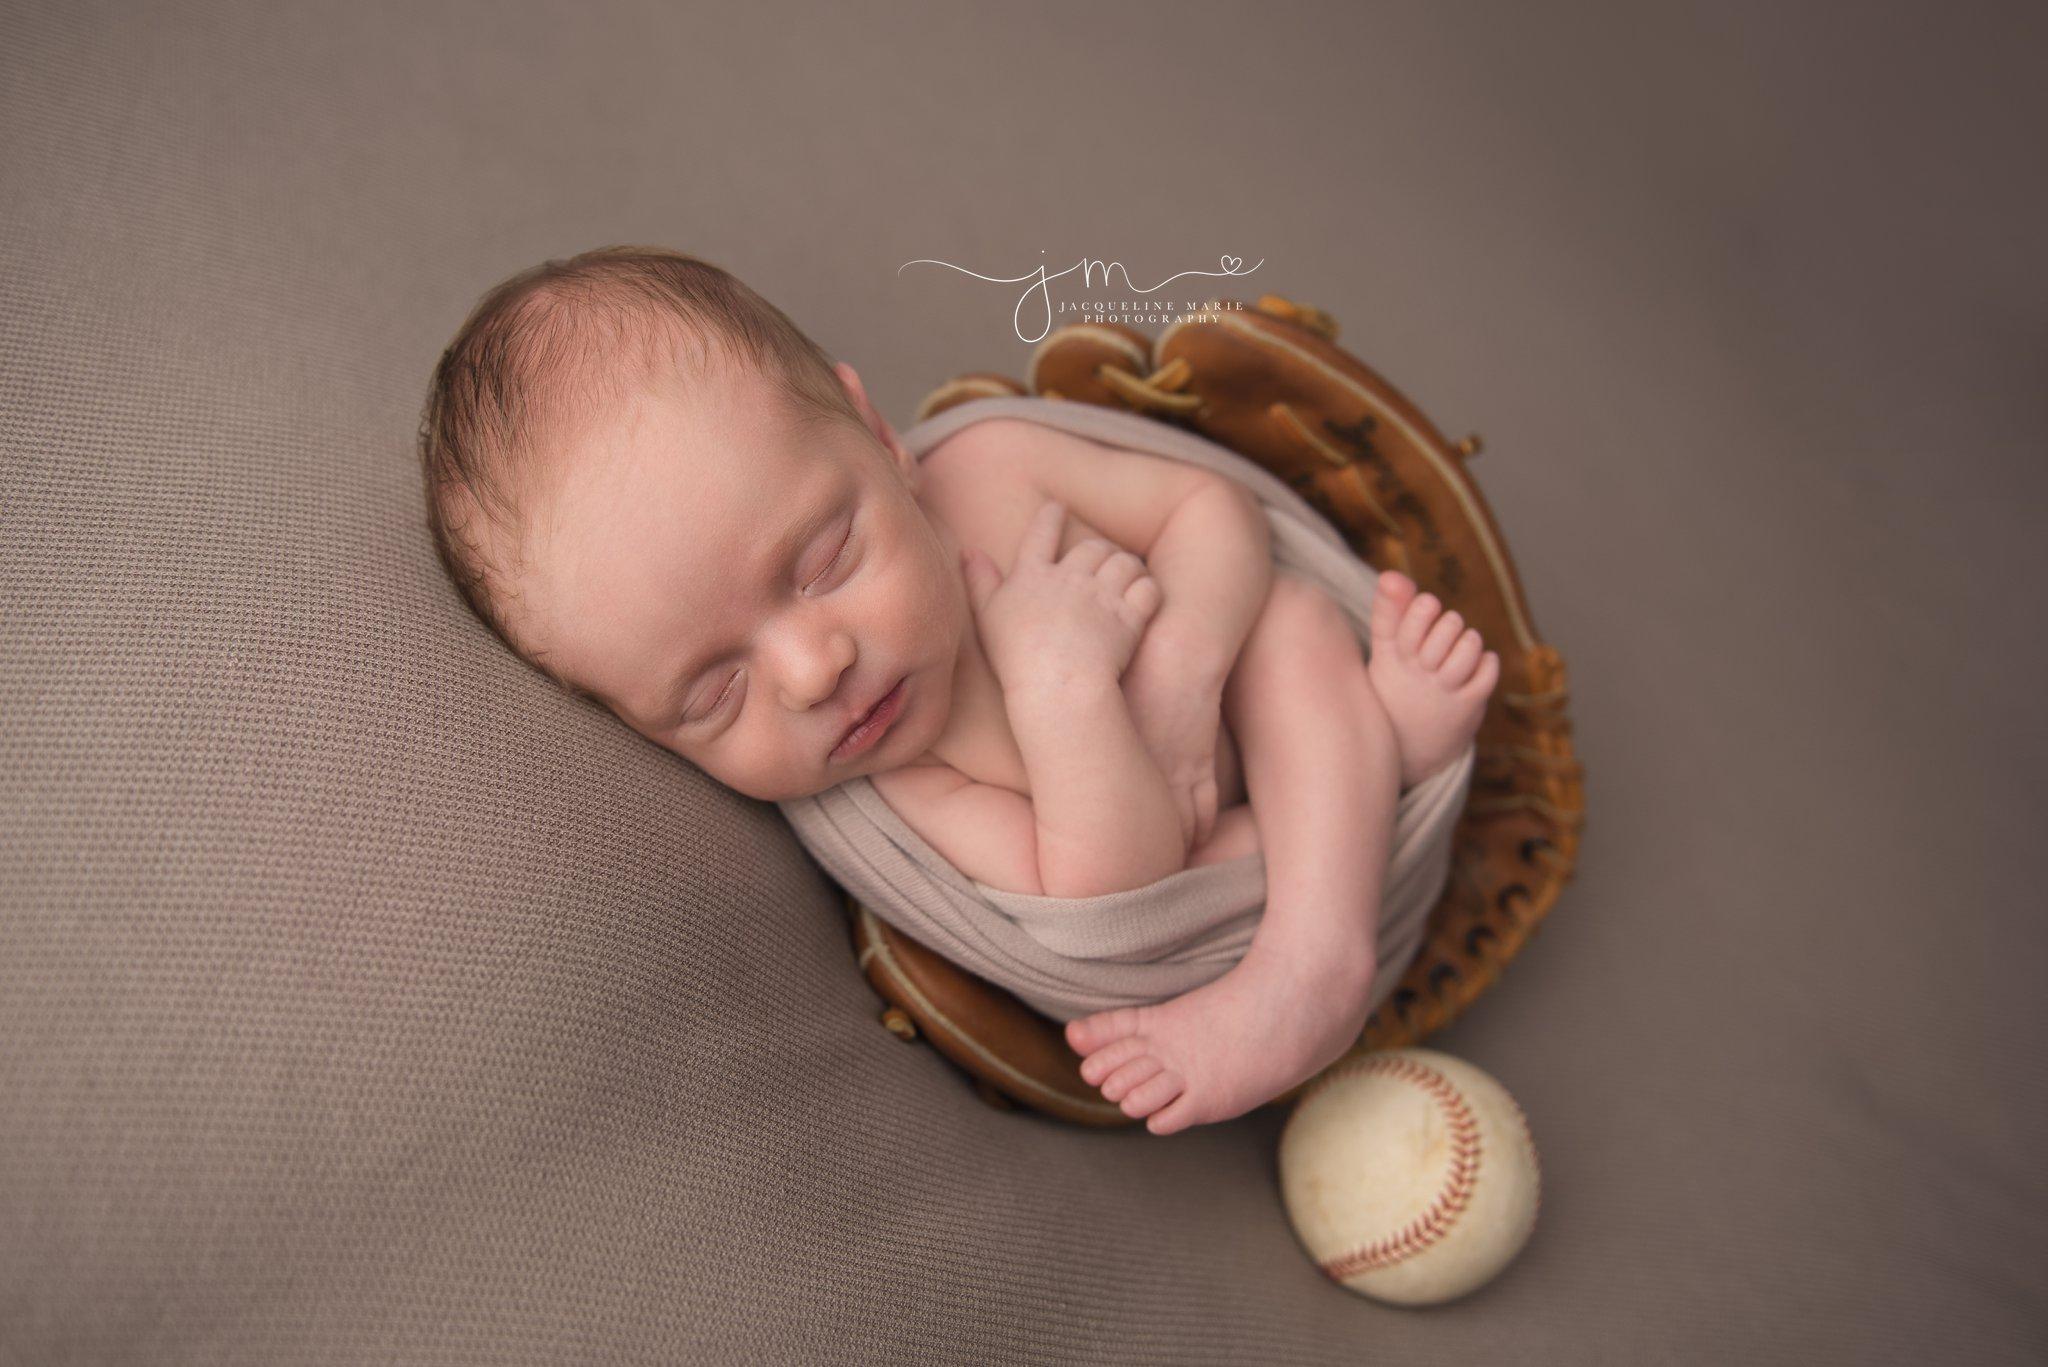 columbus ohio newborn photographer features images of newborn baby boy sleeping is dad's baseball glove